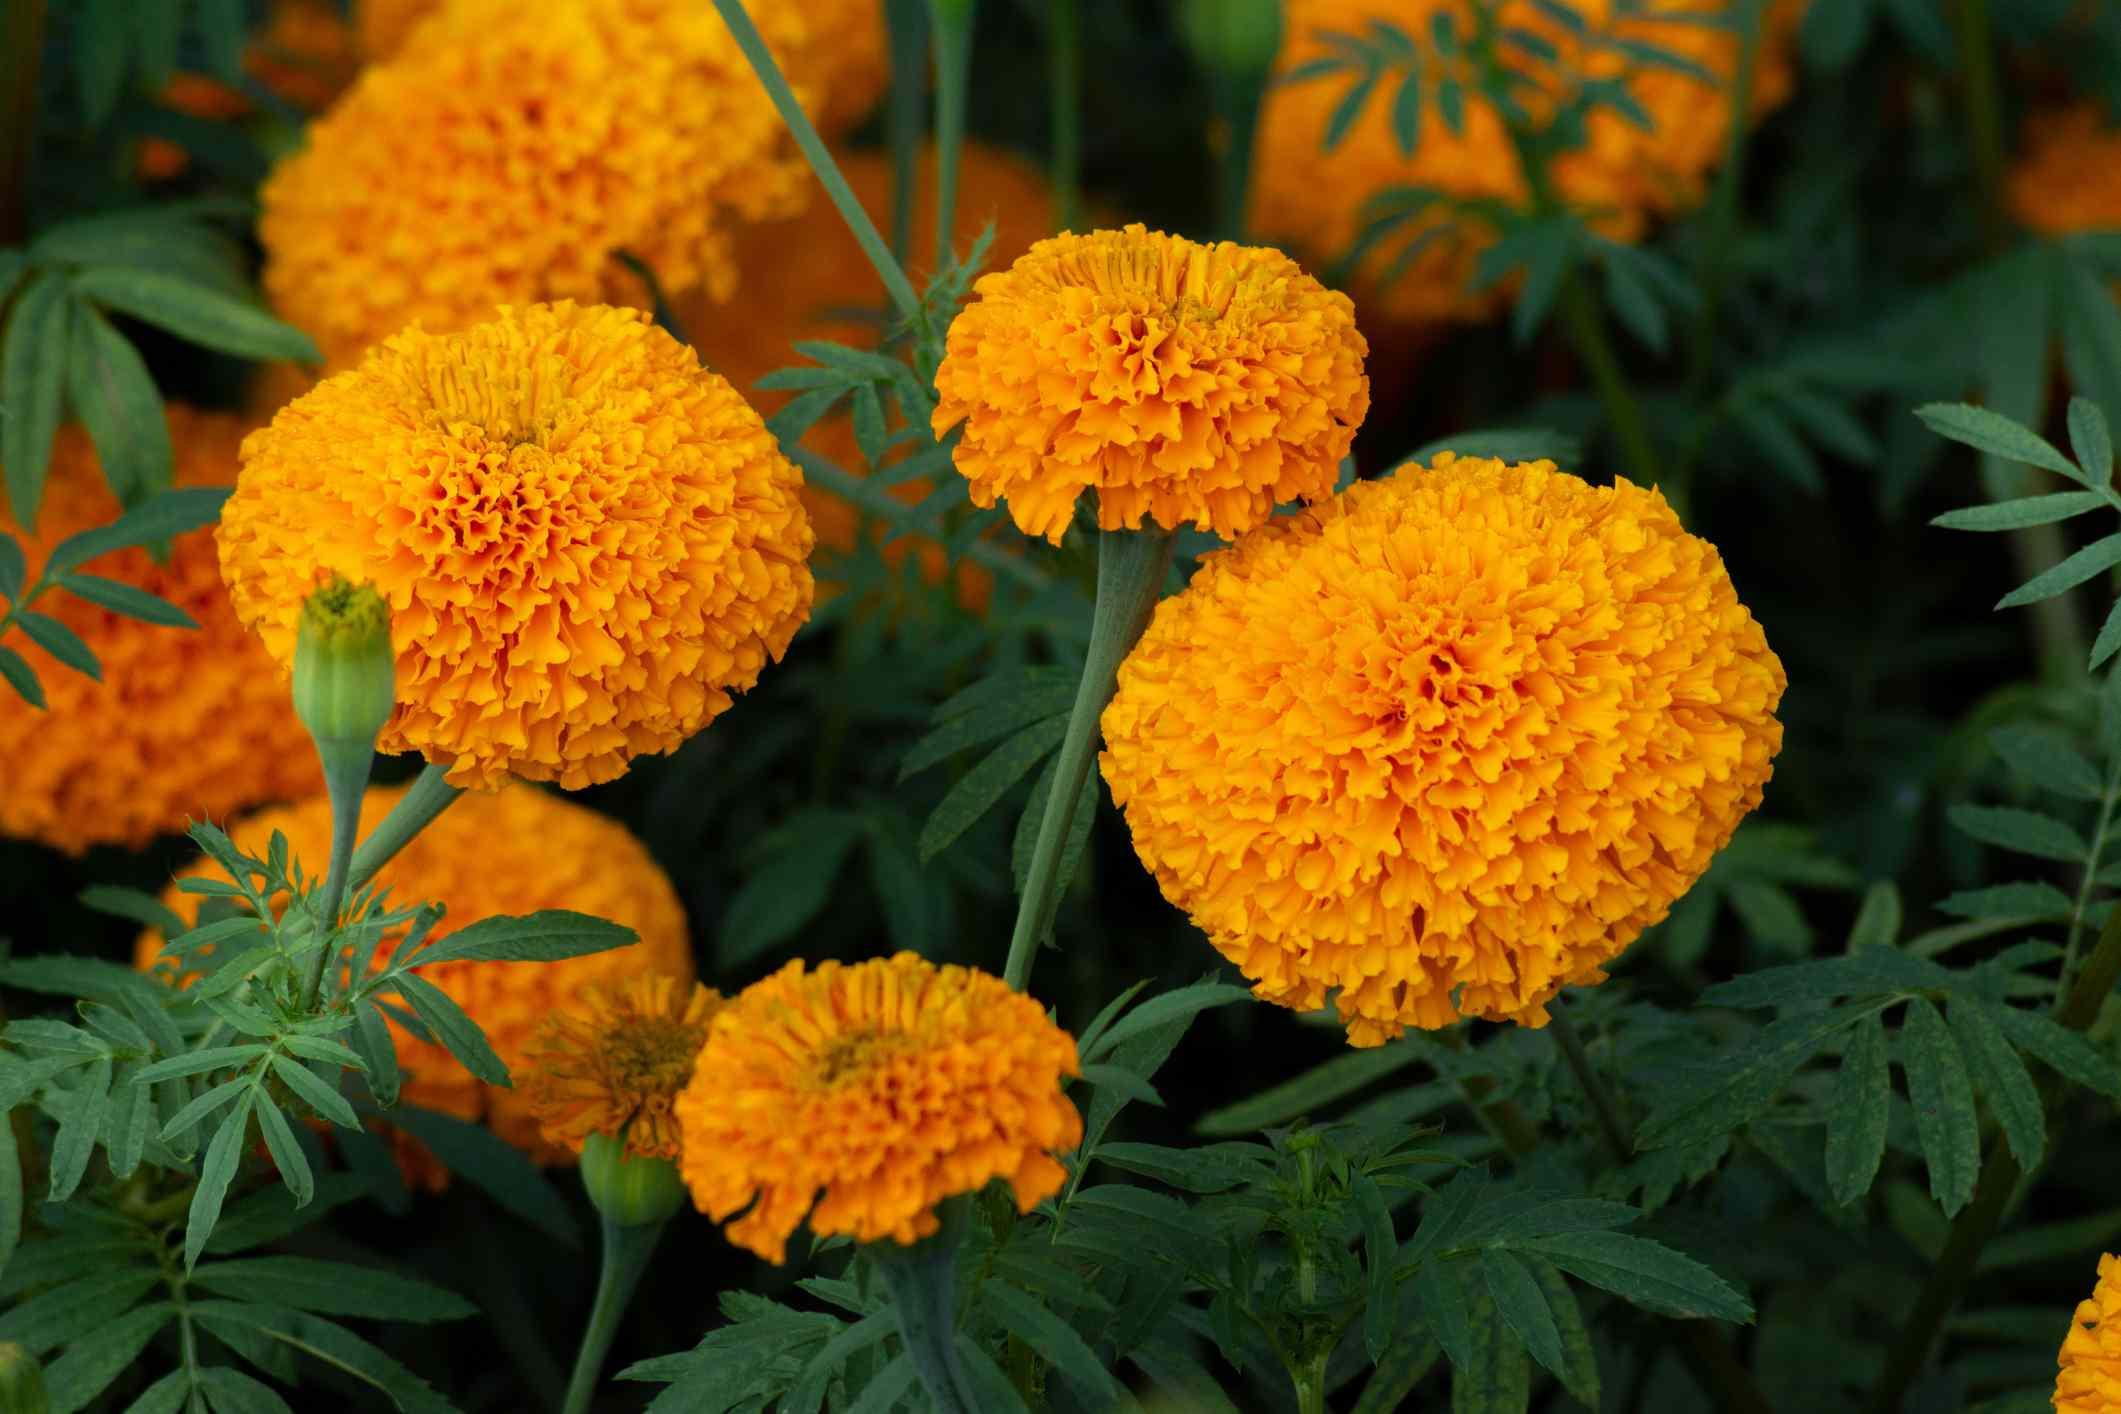 Pom-pomlike orange marigold blooms in a garden